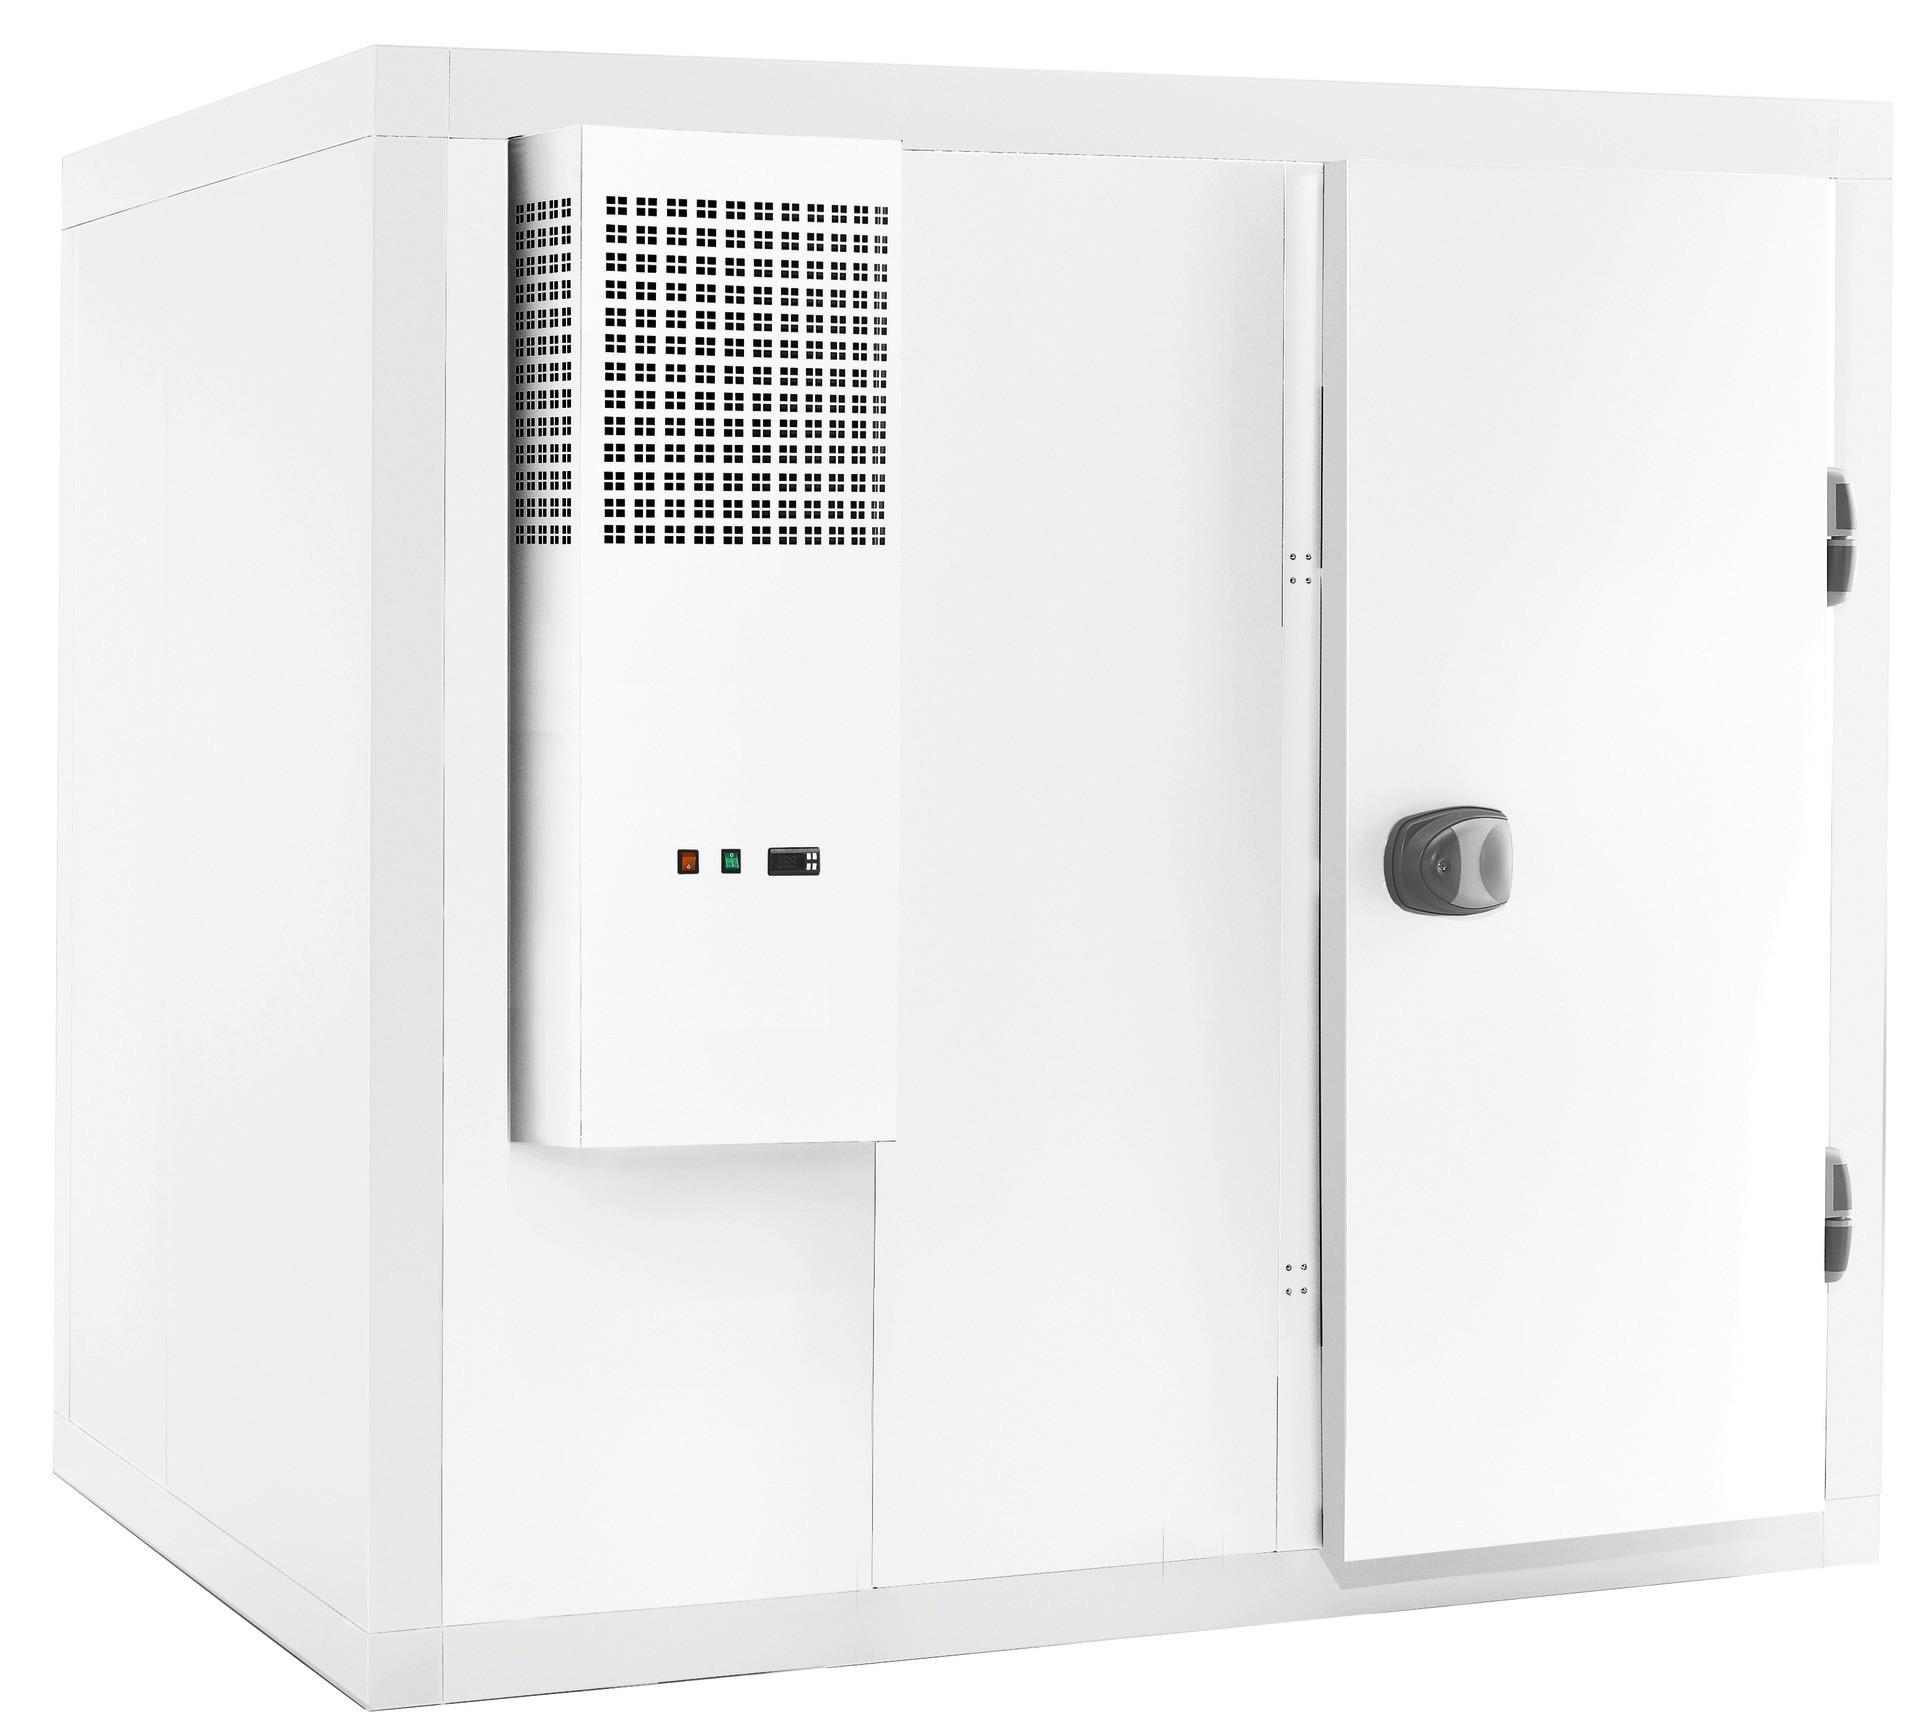 Tiefkühlaggregat für Kühlzelle 661049, 661050, 661052, 661054